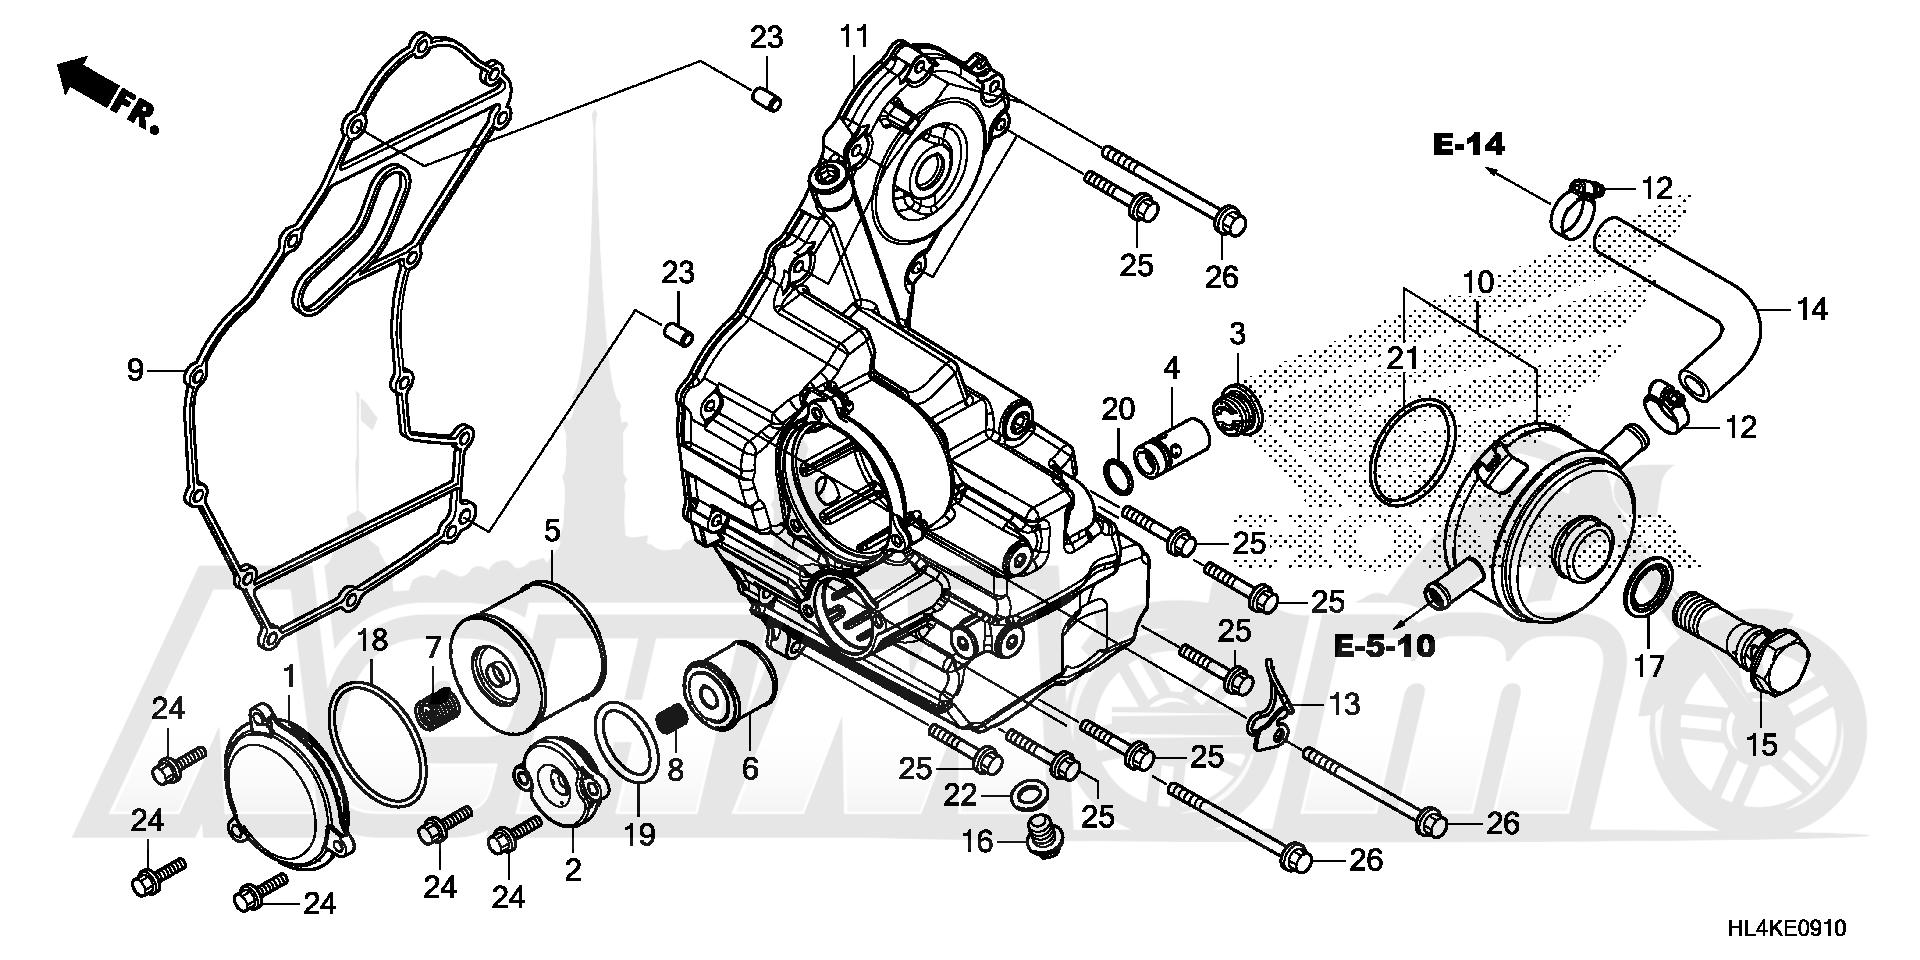 Запчасти для Квадроцикла Honda 2019 SXS1000M3L Раздел: OIL COOLER   маслянный радиатор